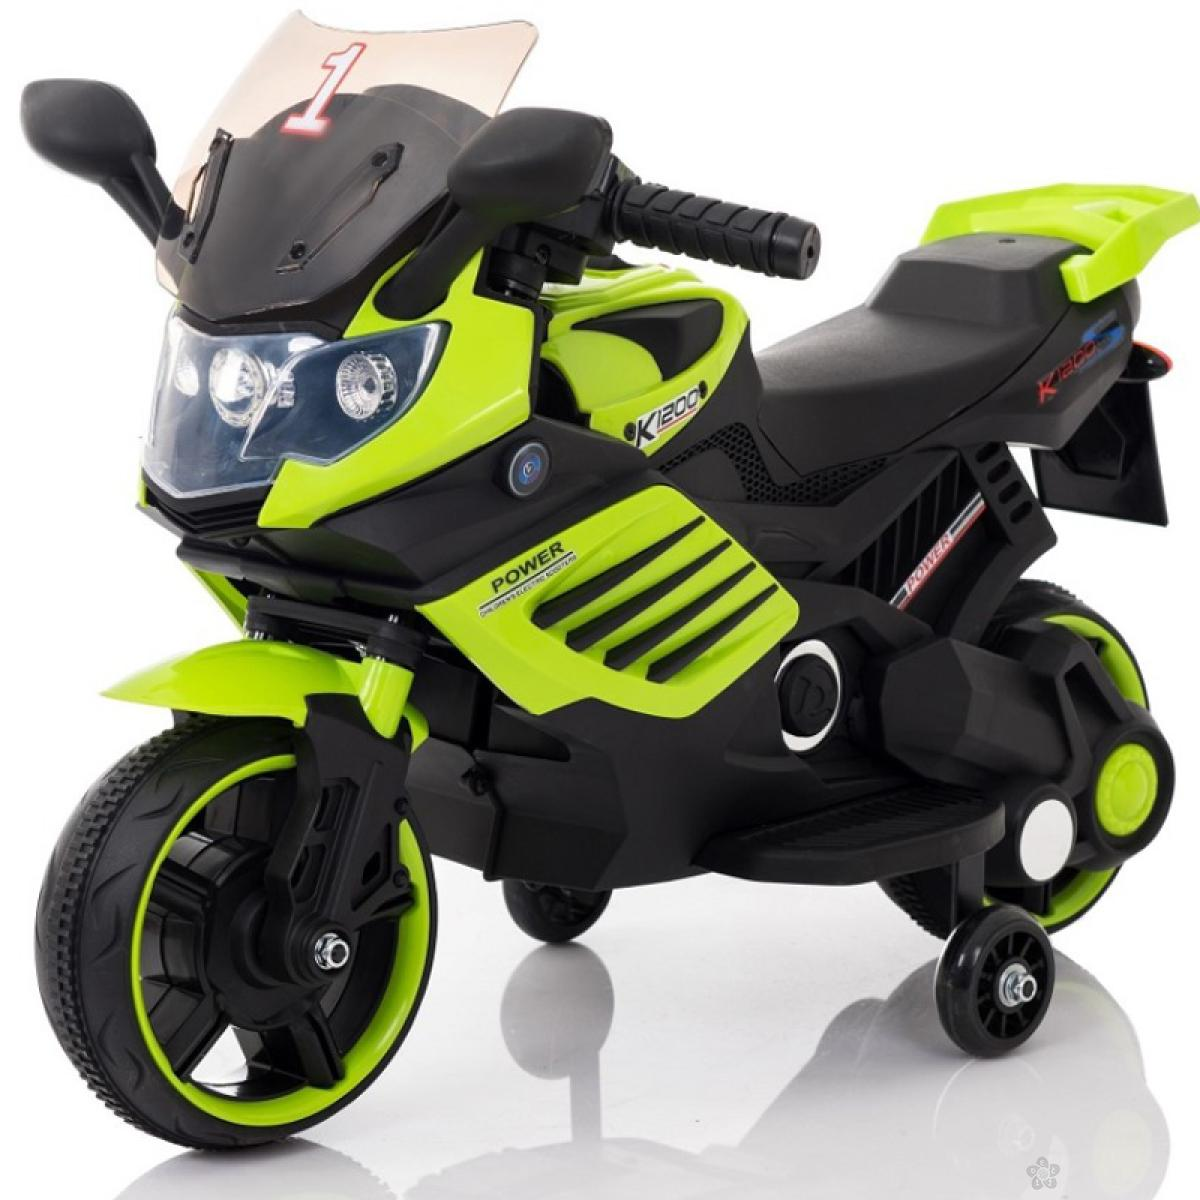 Motor na akumulator, model 116 zeleni